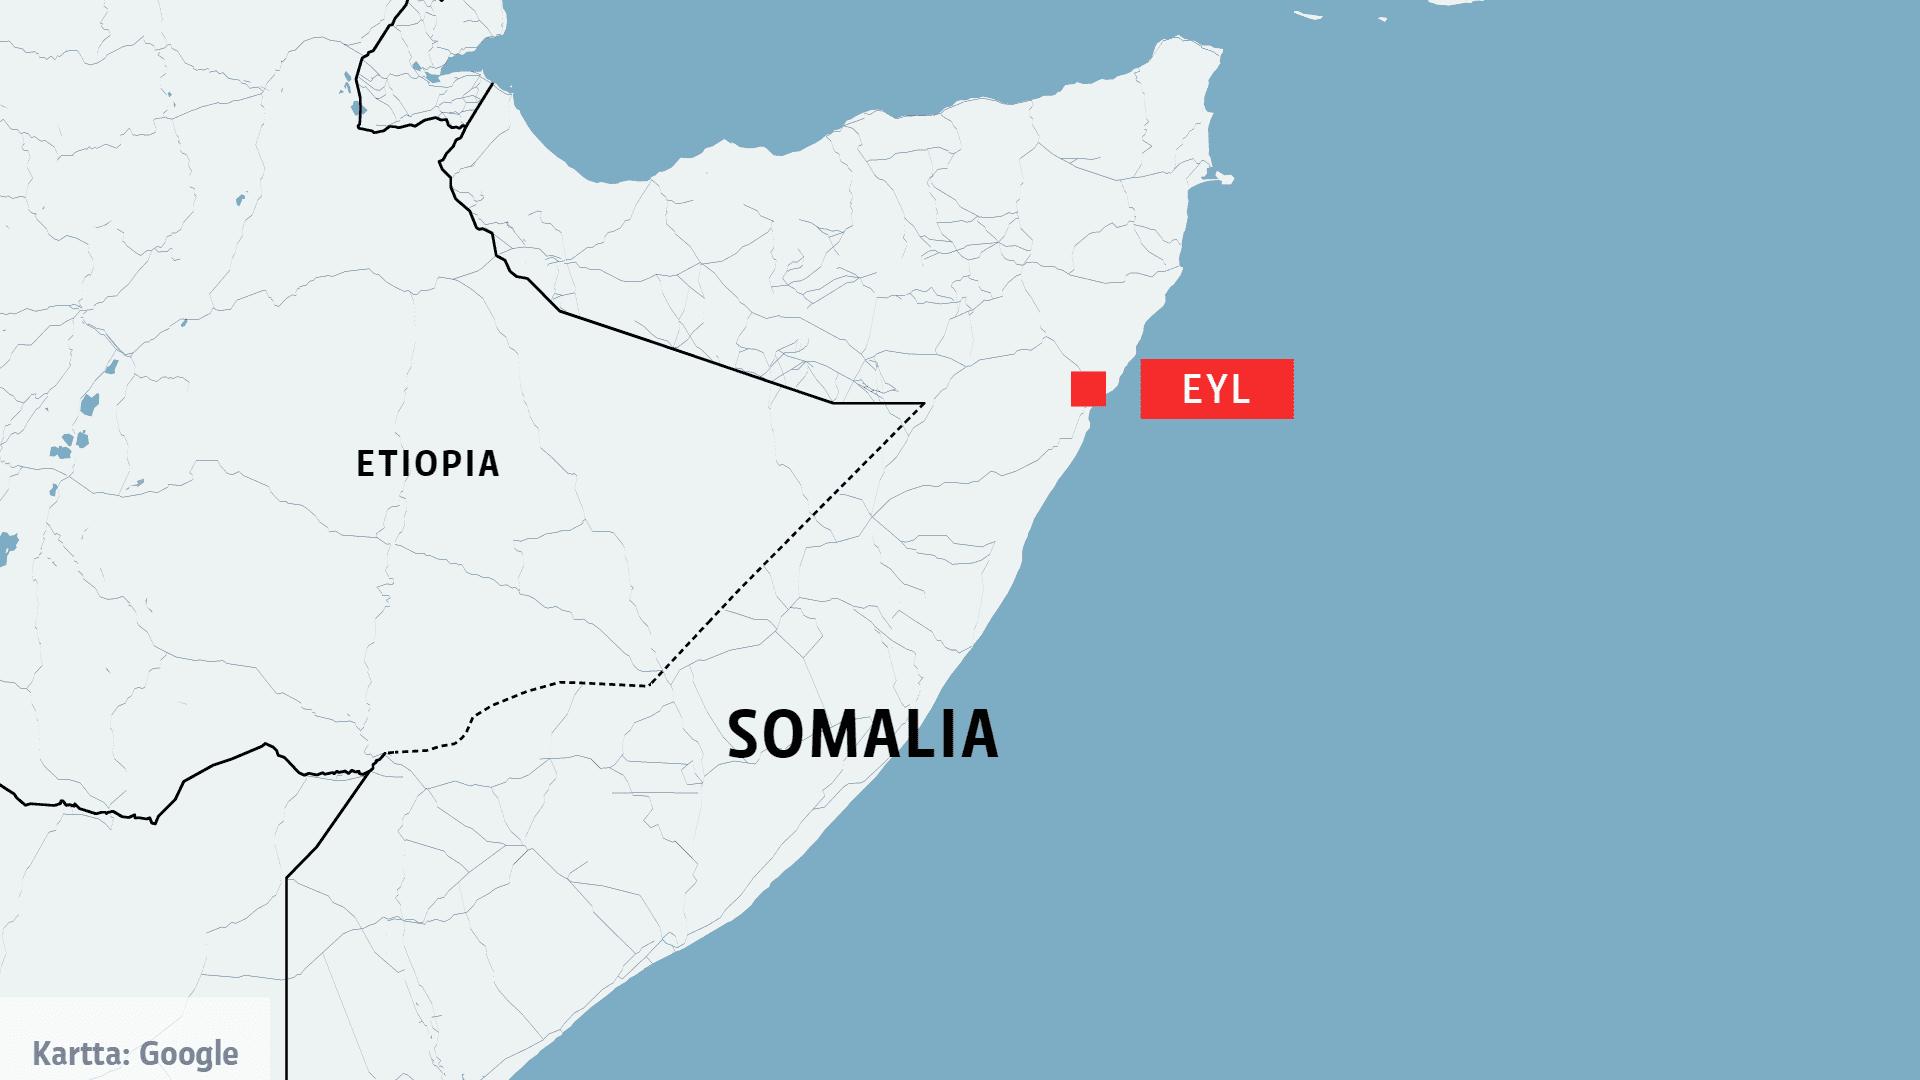 Somalian kartta.